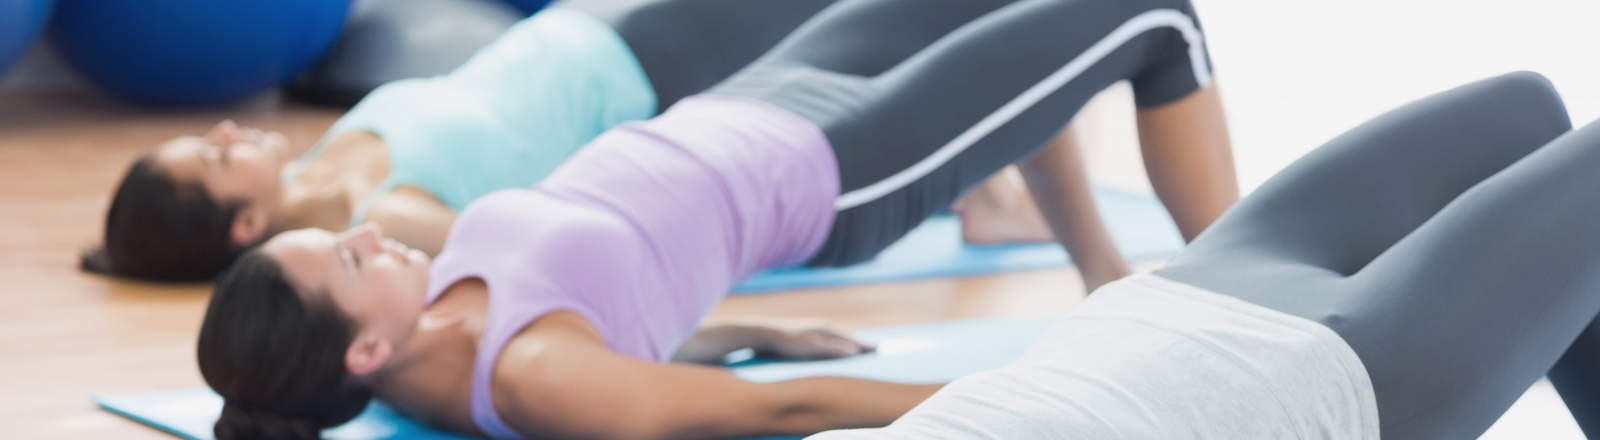 cabecera clase grupal pilates terapéutico - fisioclinics bilbao